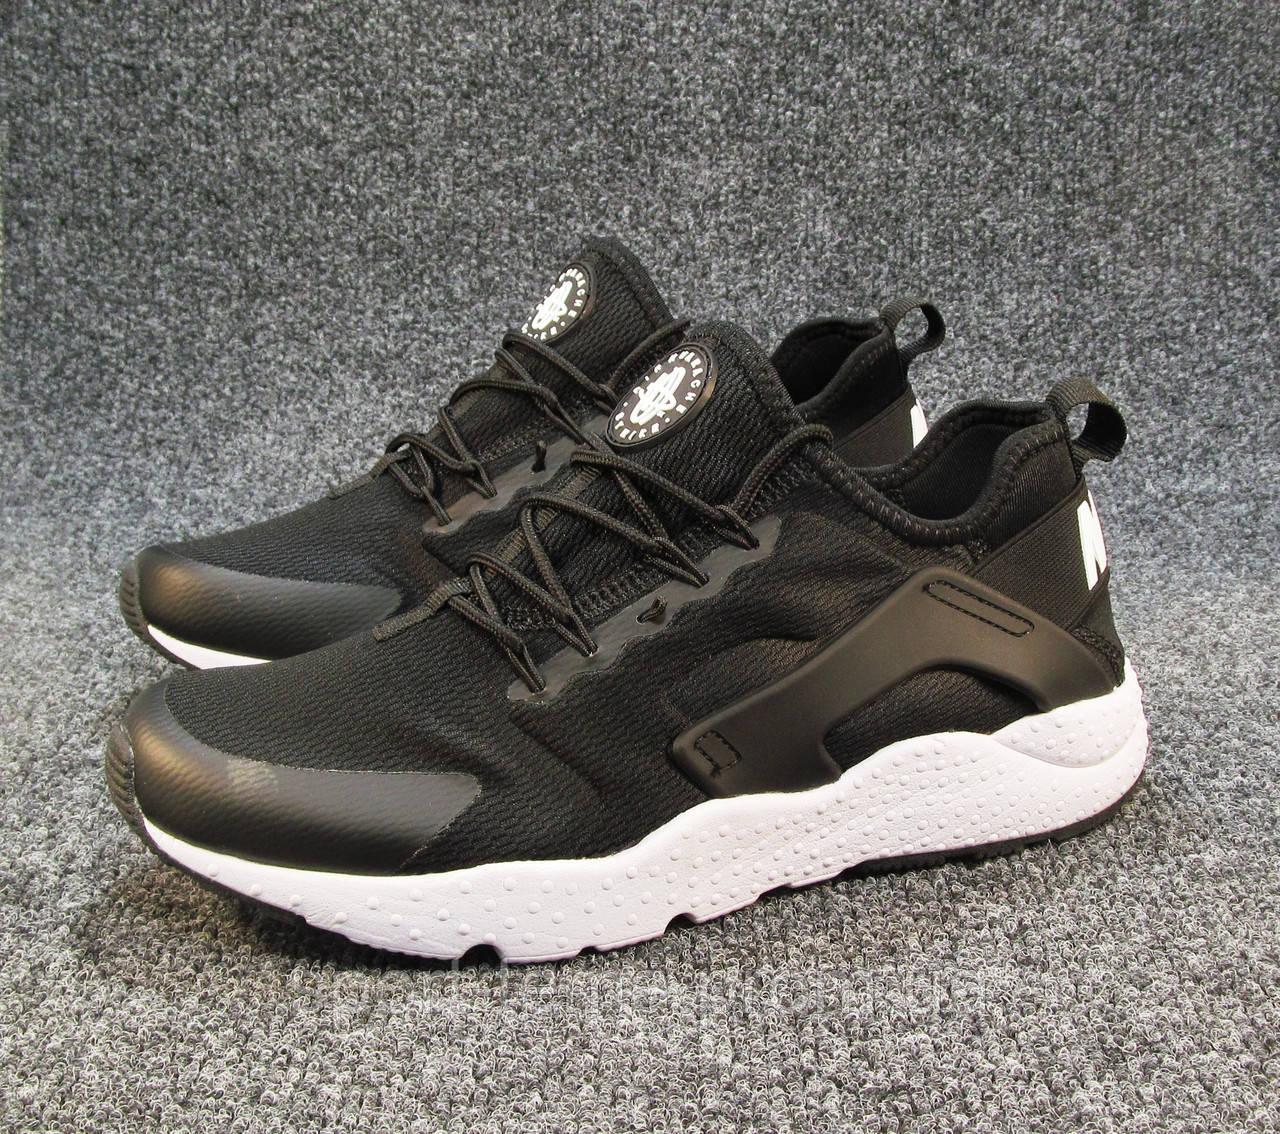 new style de28d a5191 Кроссовки Nike Huarache черные унисекс (р.39,40,41)